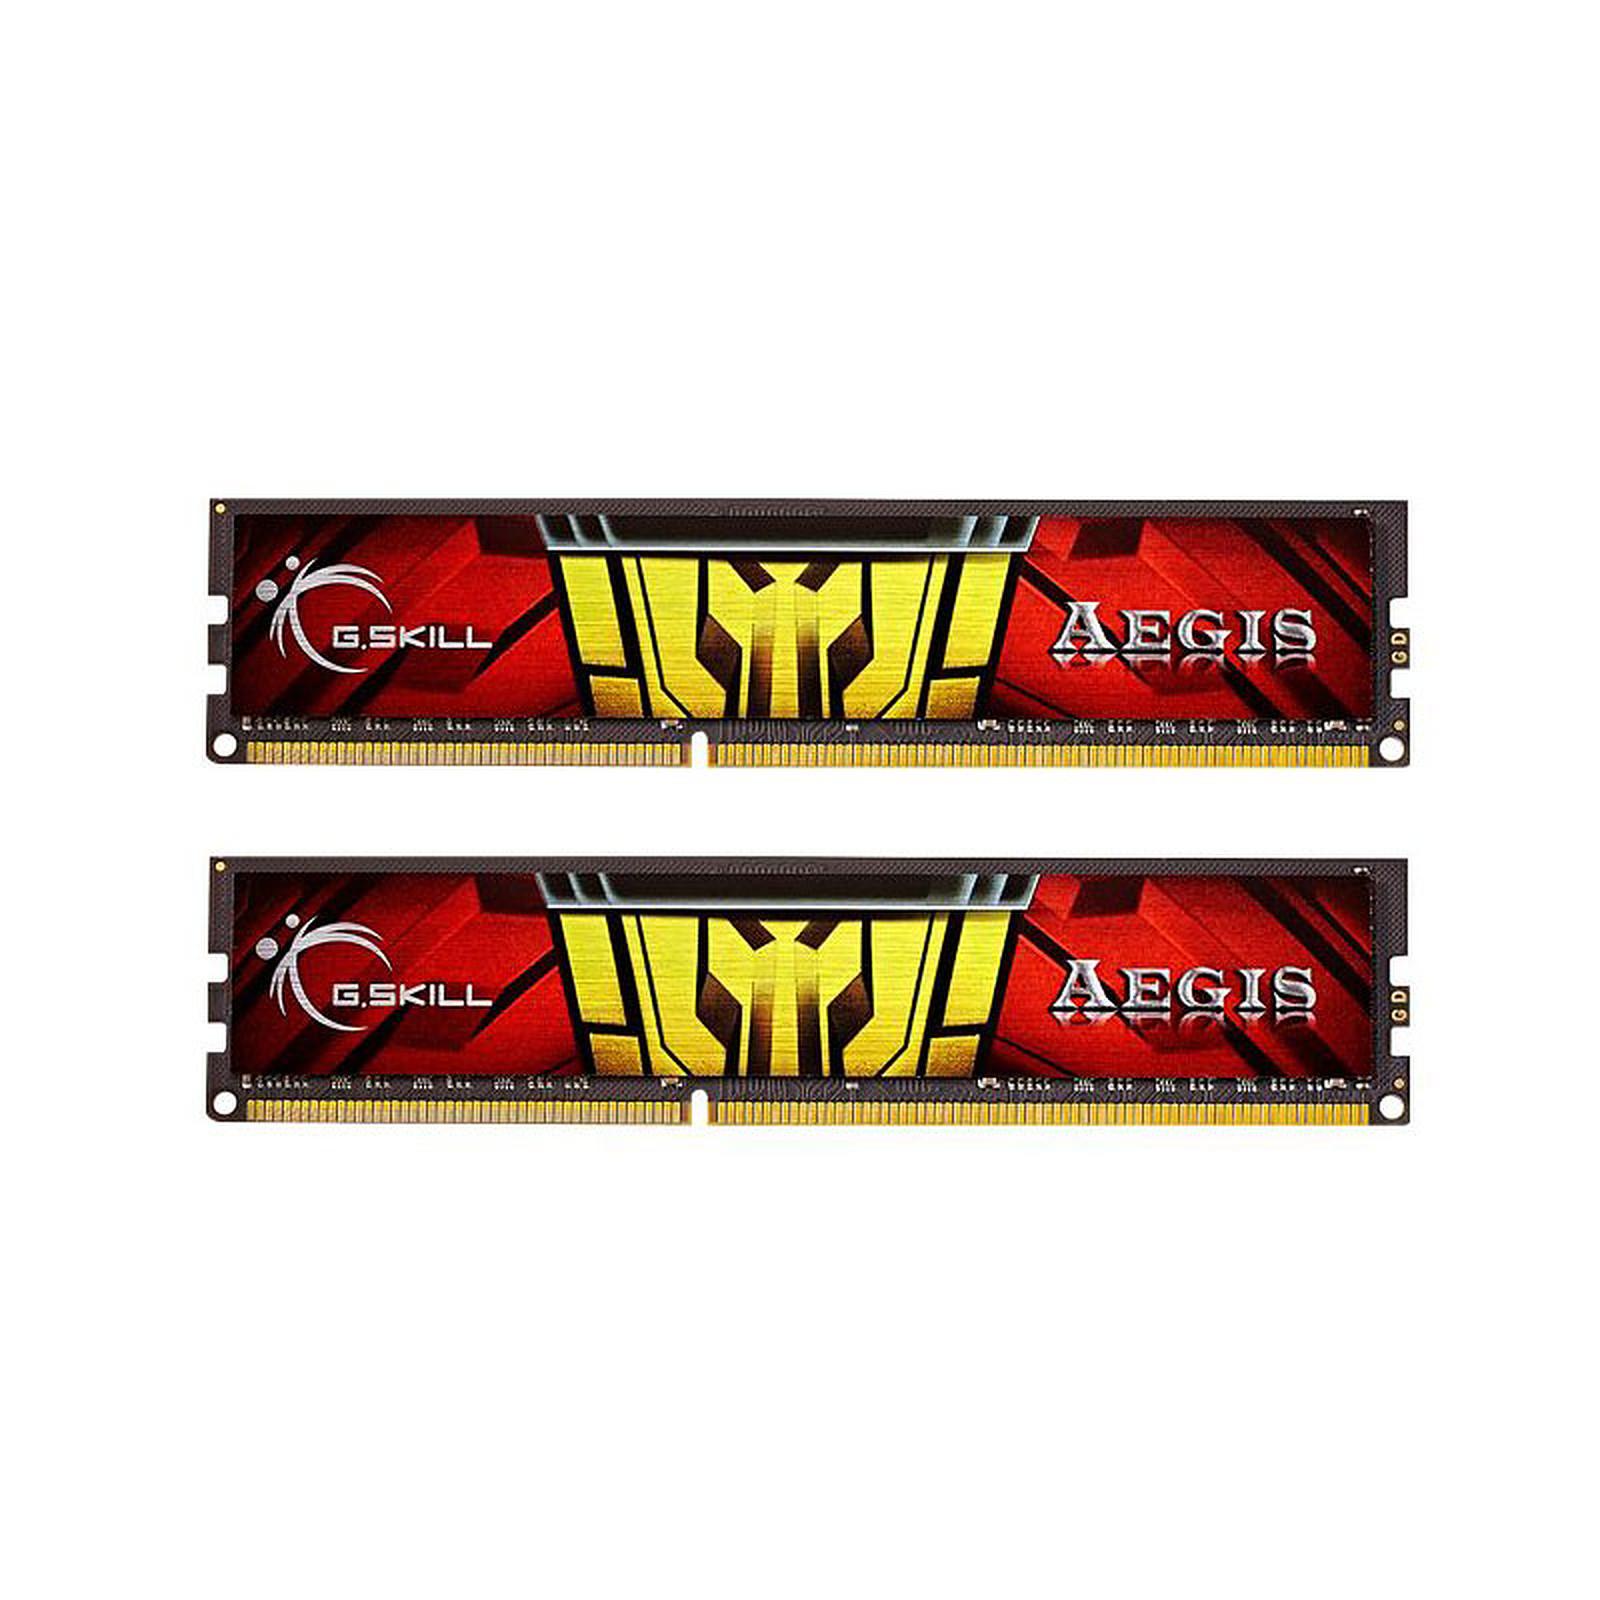 G.Skill Aegis Series 16 Go (2 x 8 Go) DDR3L 1333 MHz CL9